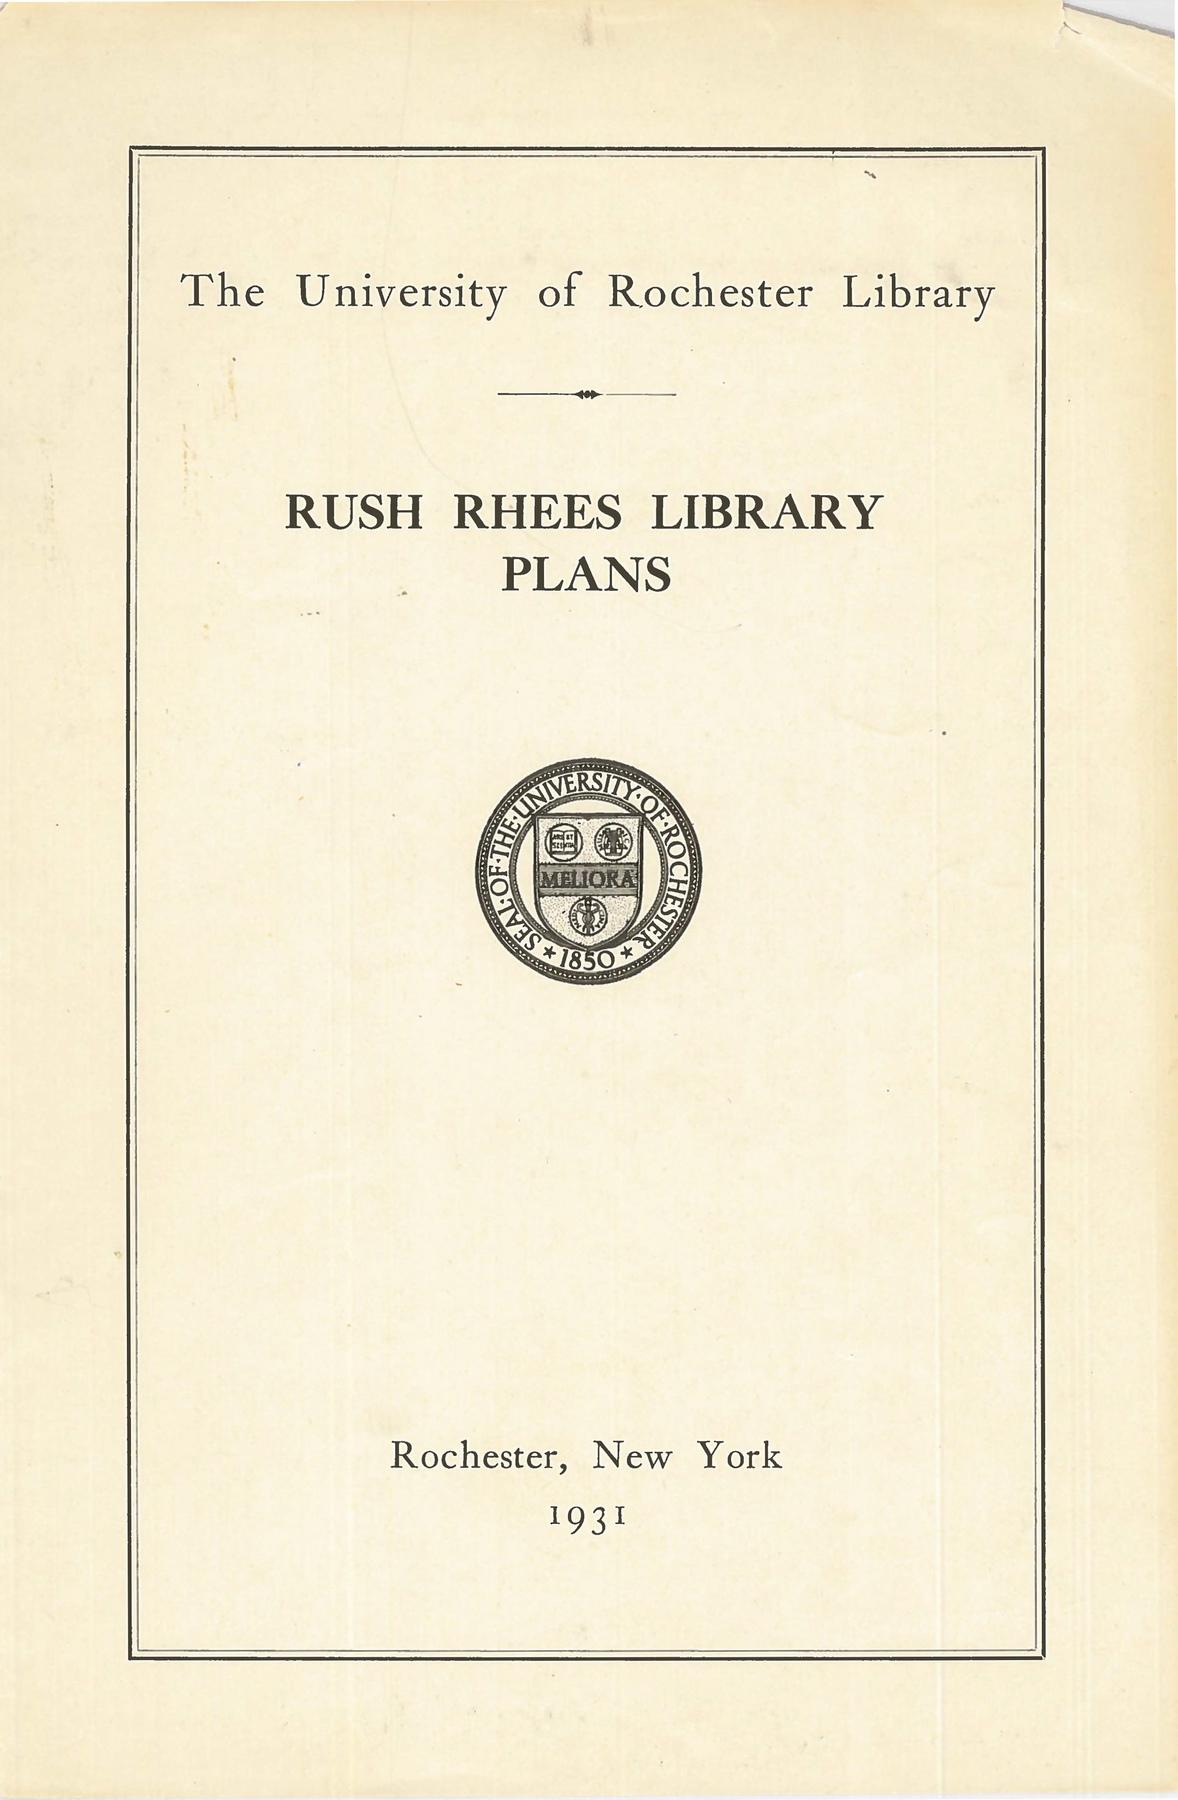 Rush Rhees Library: Floor plans (1931)